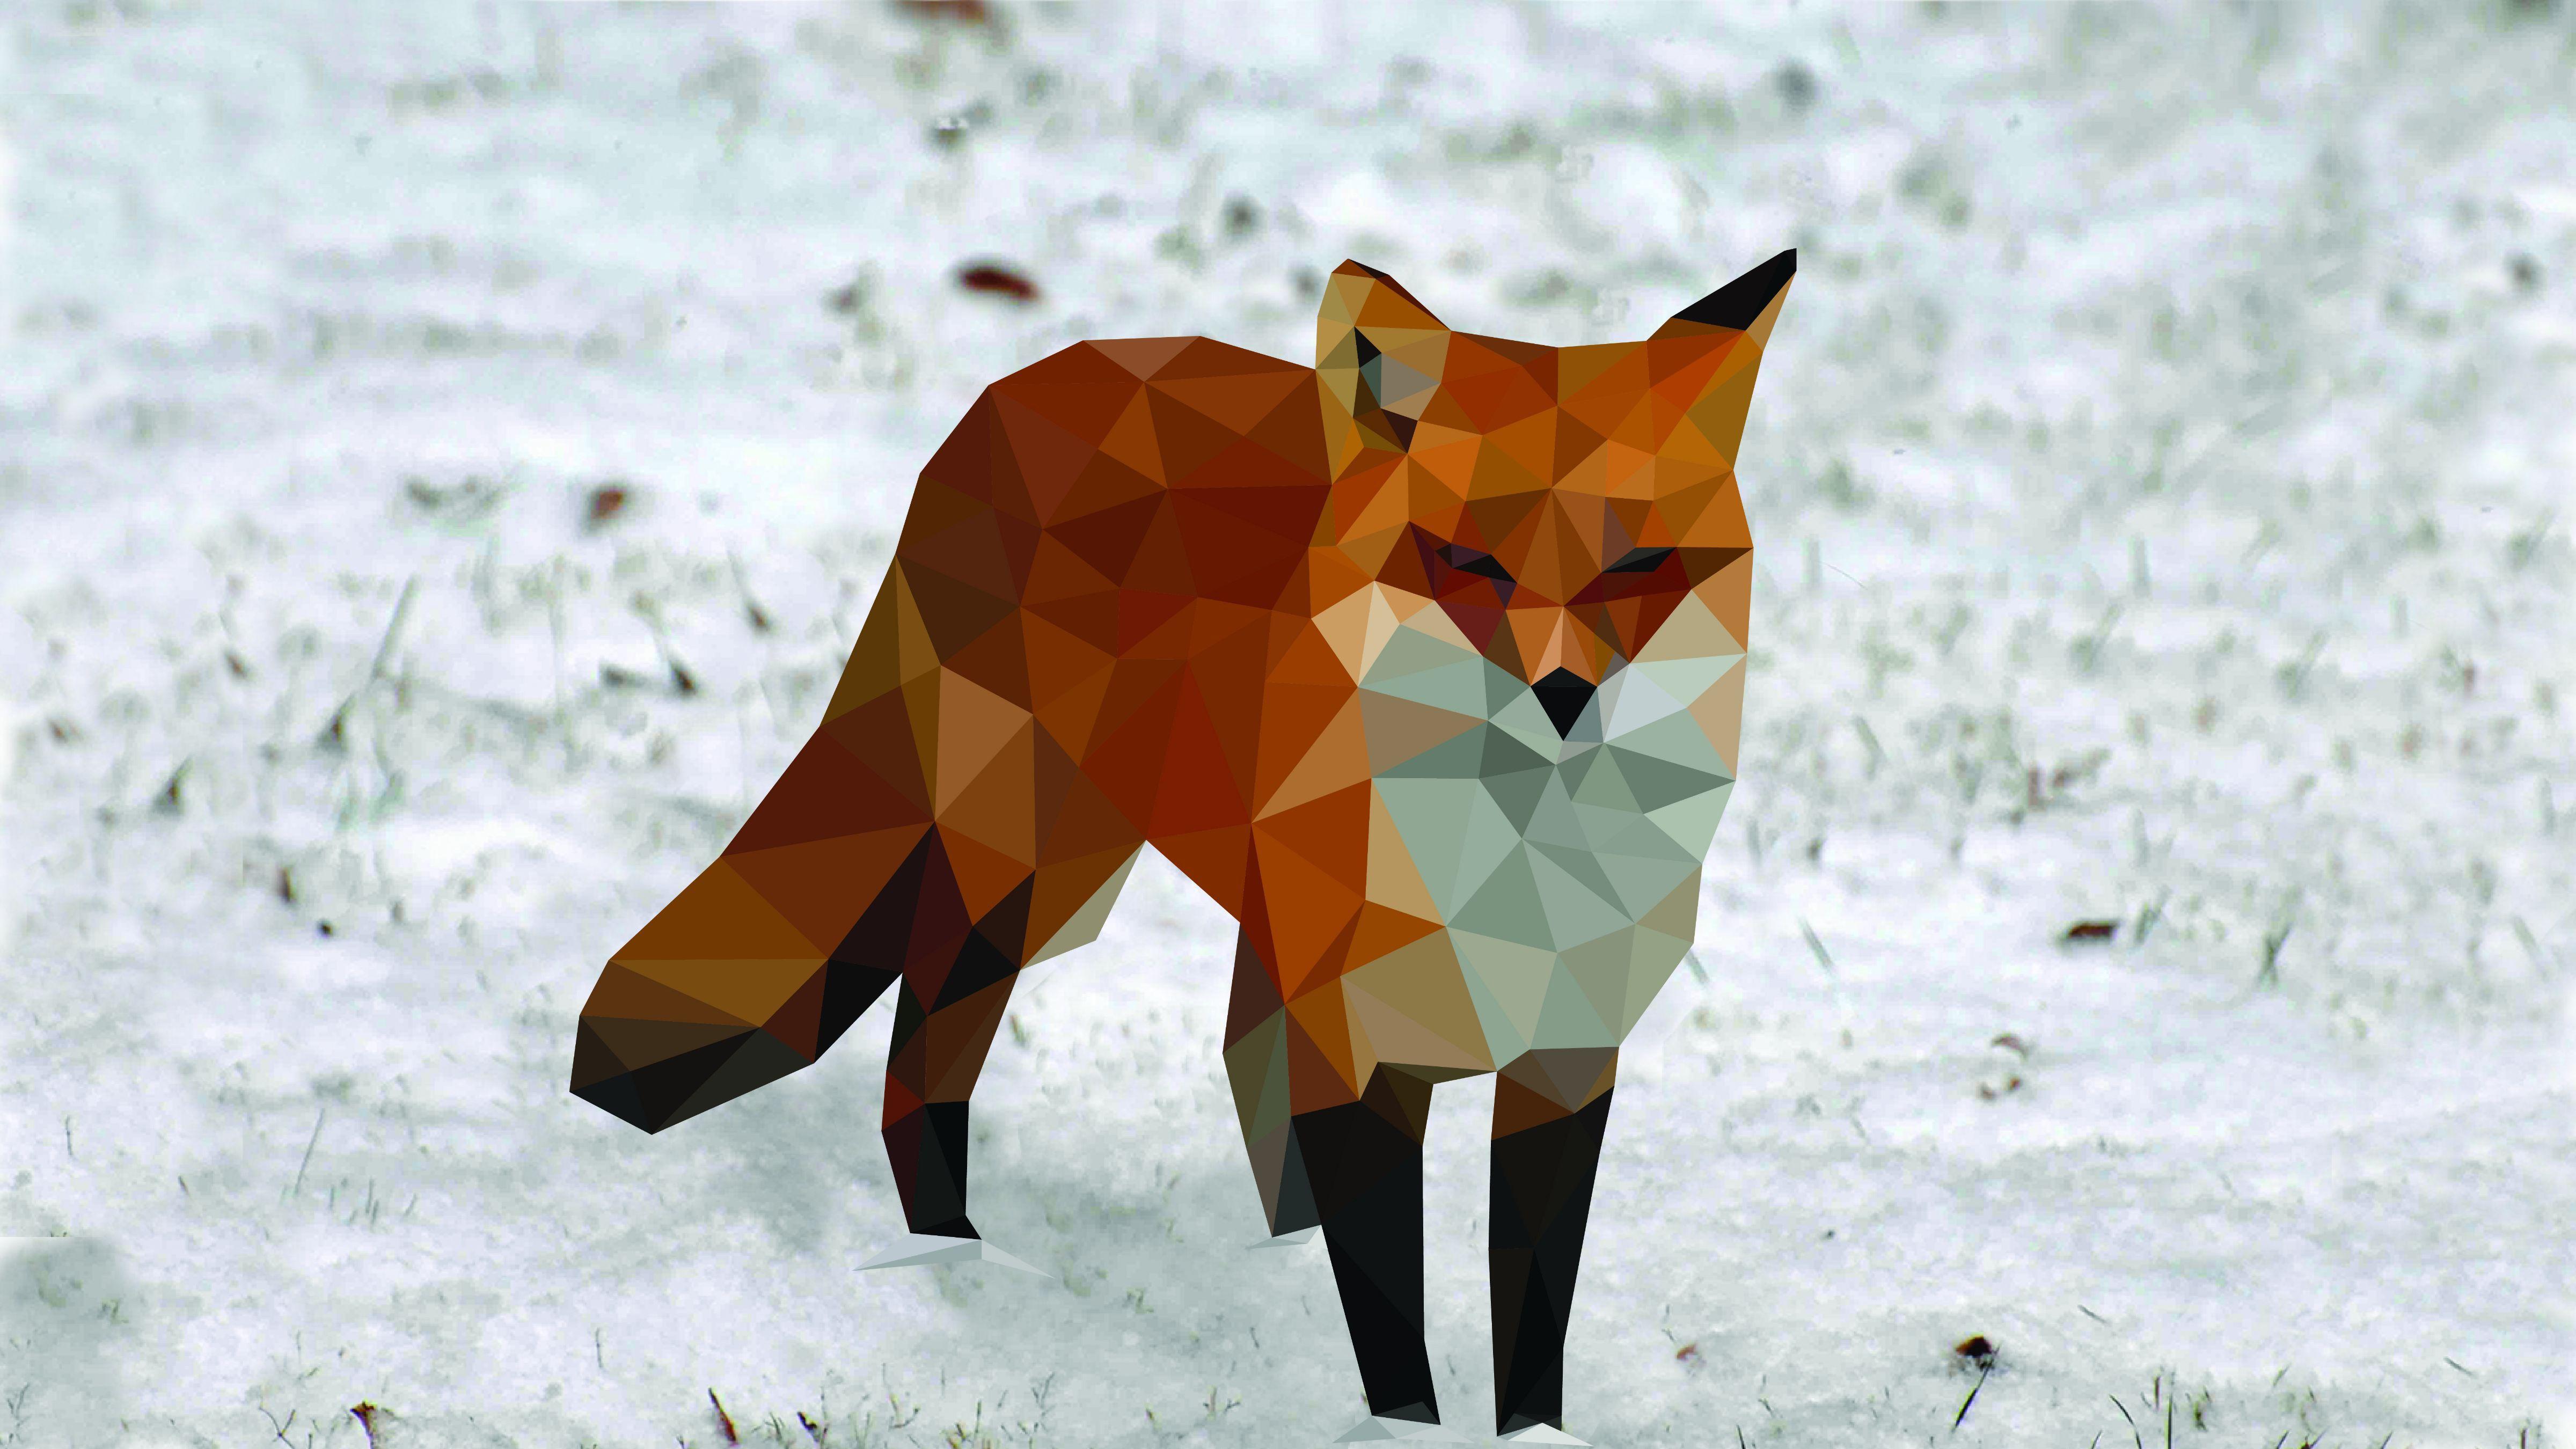 Polygon Fox Wallpapers